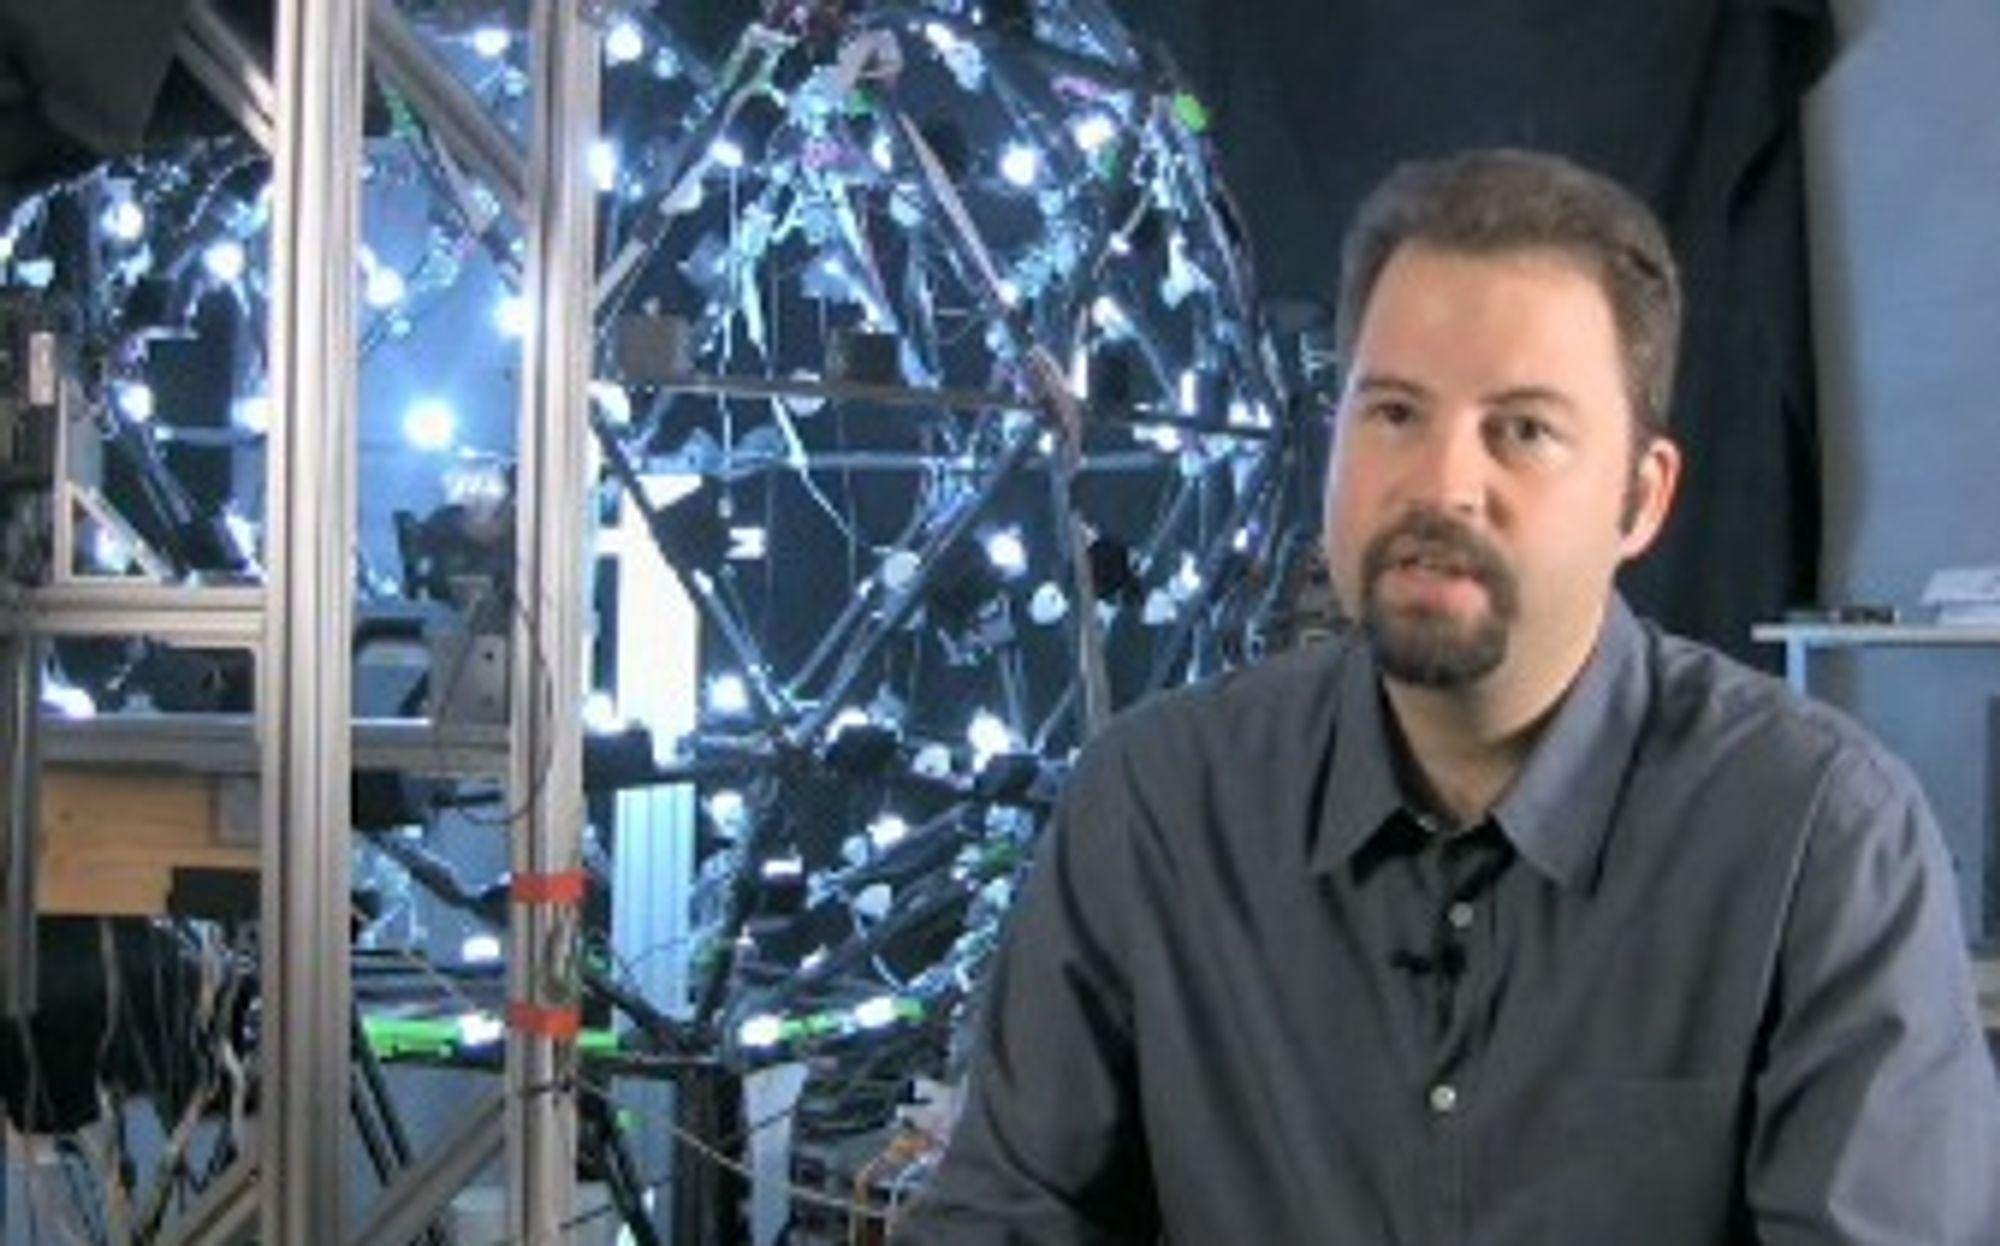 Paul Debvec foran kulen med LED-lys